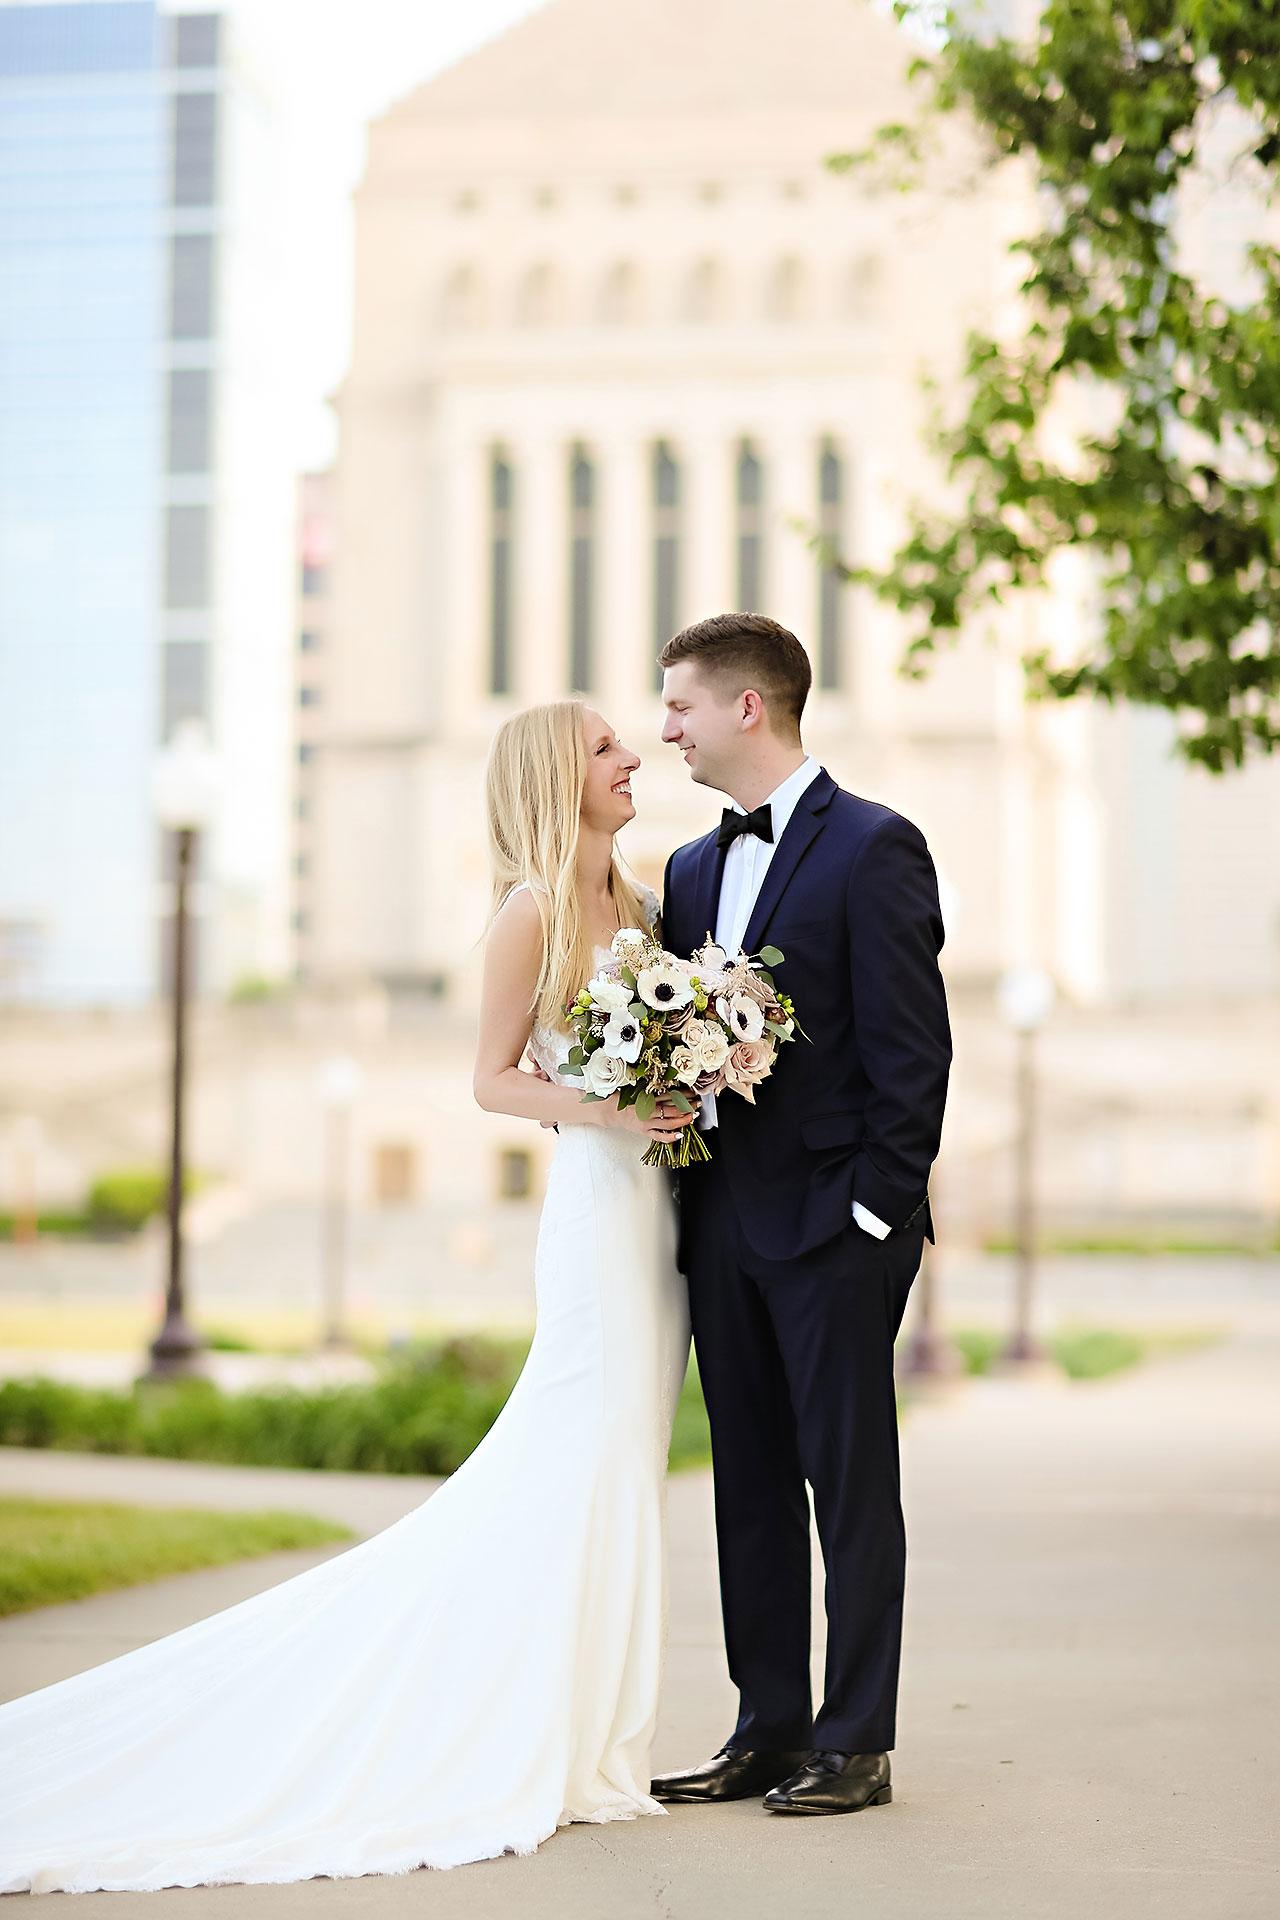 Molly Declan Scottish Rite Indianapolis Wedding 174